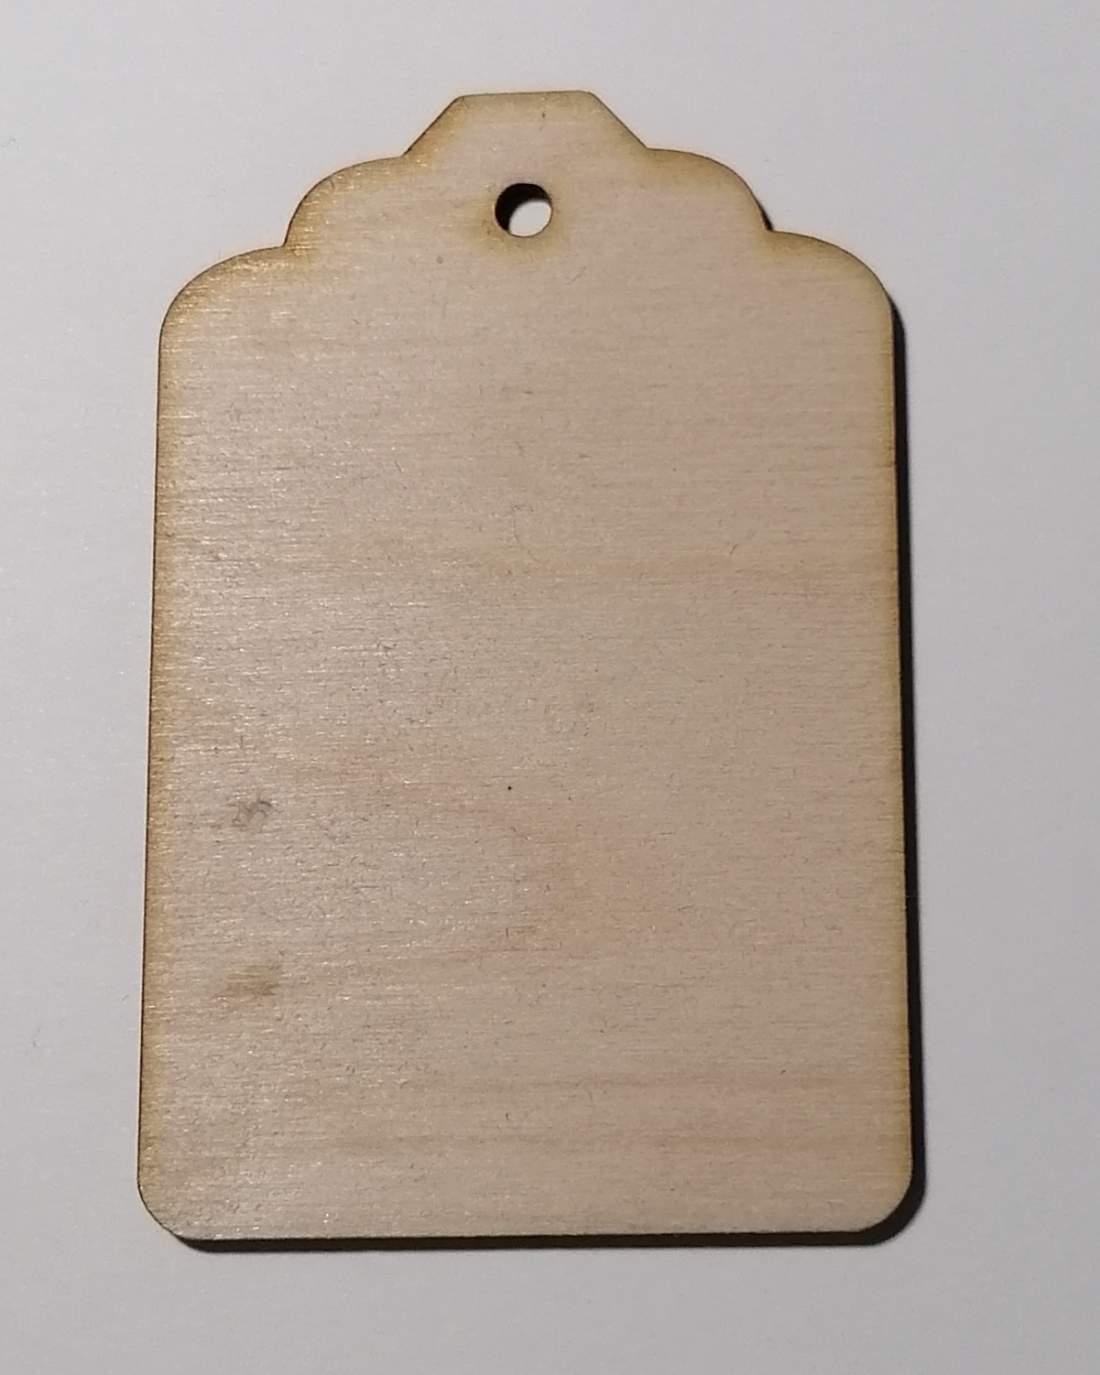 Natúr fa tábla nagy - 5 darab/csomag